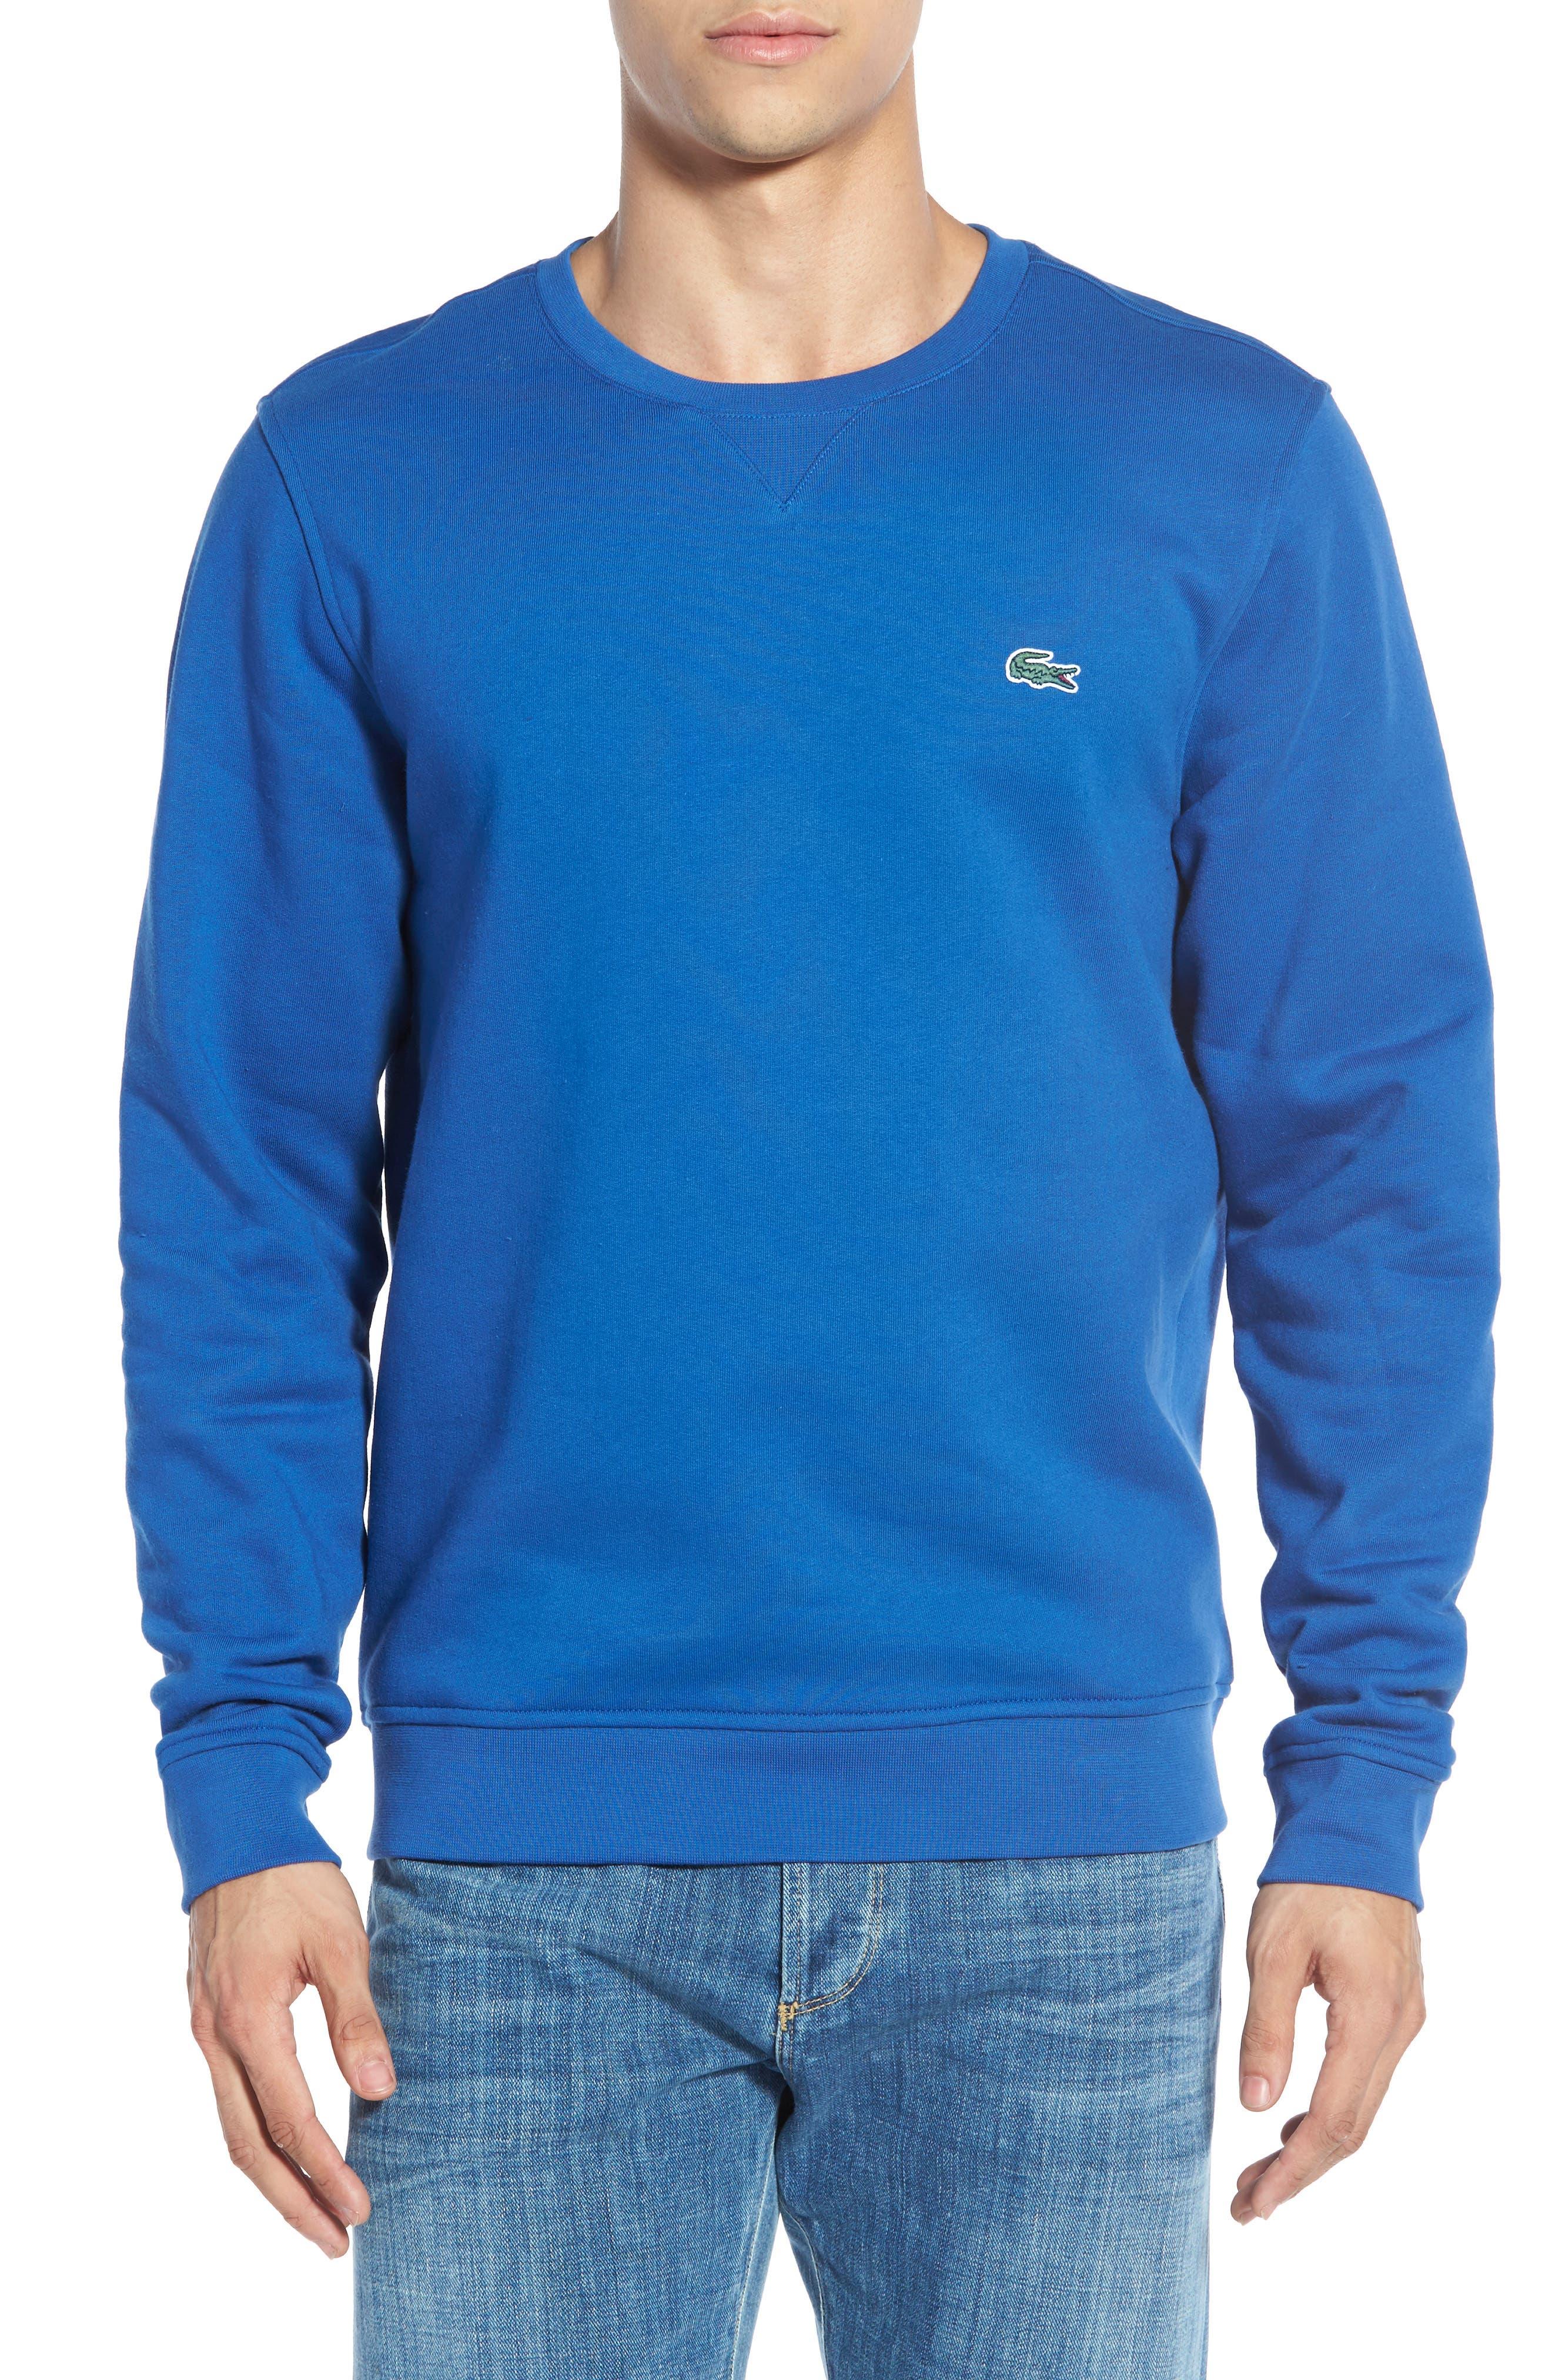 'Sport' Crewneck Sweatshirt,                             Main thumbnail 1, color,                             NAVY